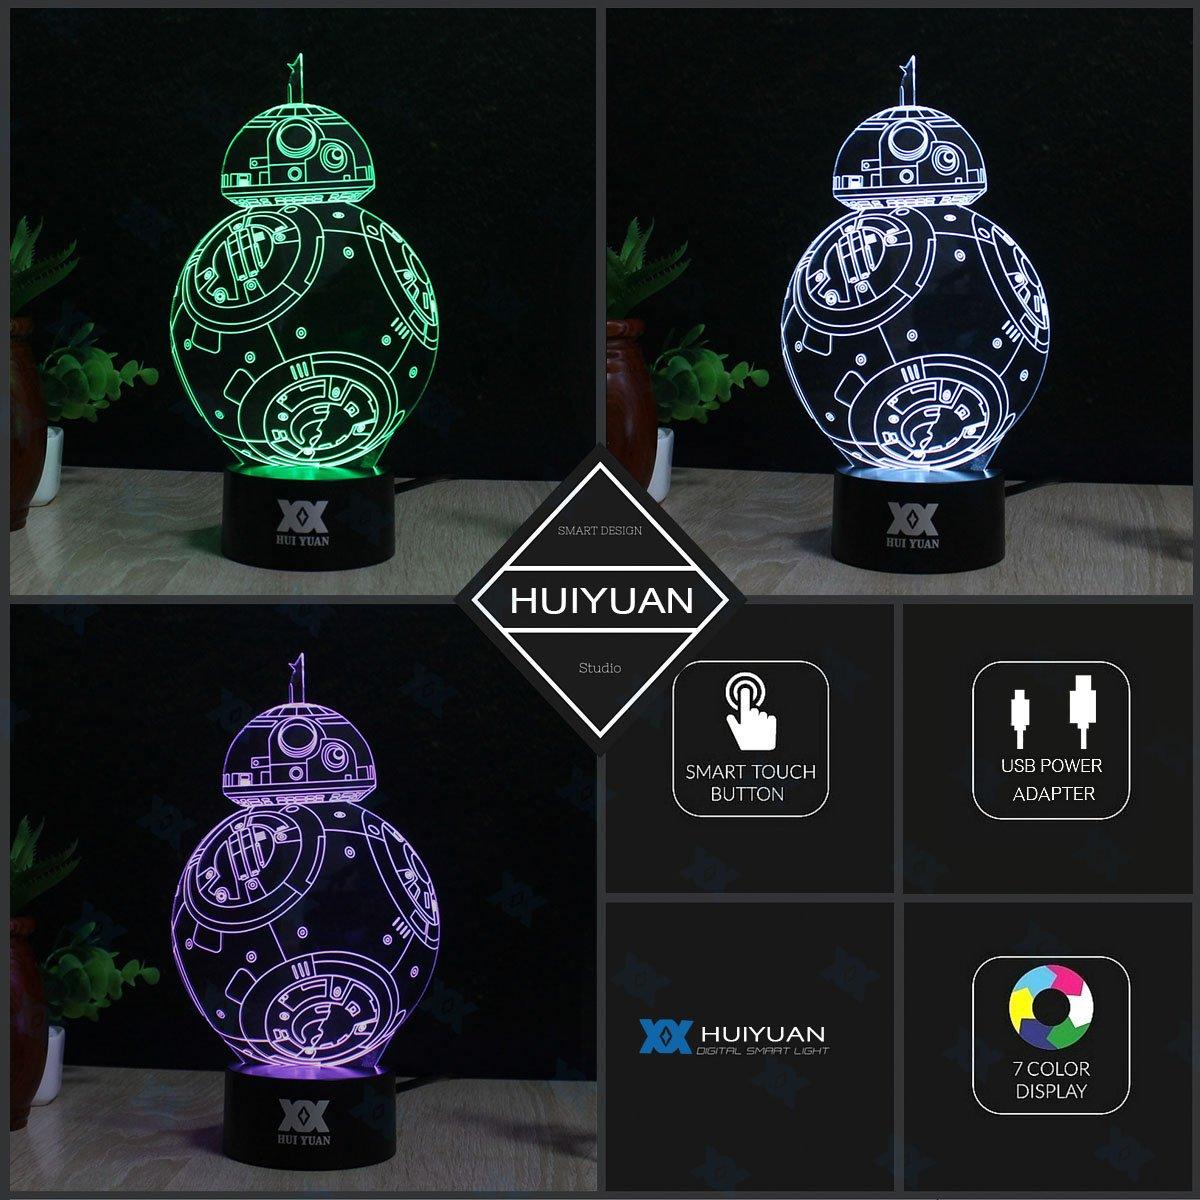 3D Lamp Fuwa Force Awaken Night light 7 Color Change Best Gift Night Light LED Desk Table Lighting Home Decoration Toys…